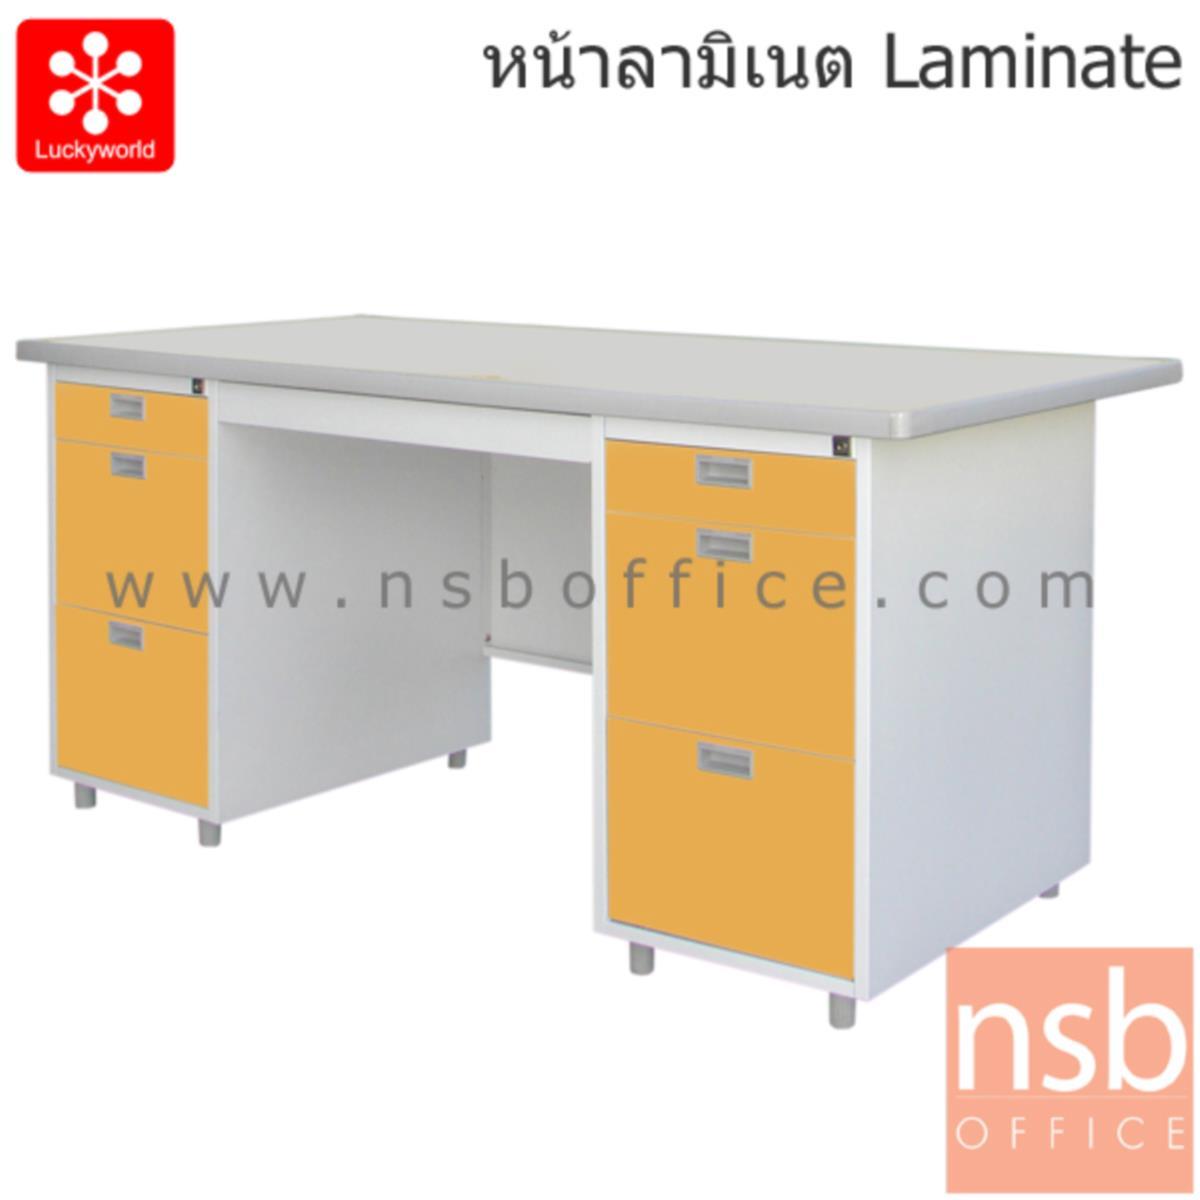 E31A002:โต๊ะทำงานเหล็ก 7 ลิ้นชัก รุ่น DL-52-33 159.5W cm. หน้าลามิเนท